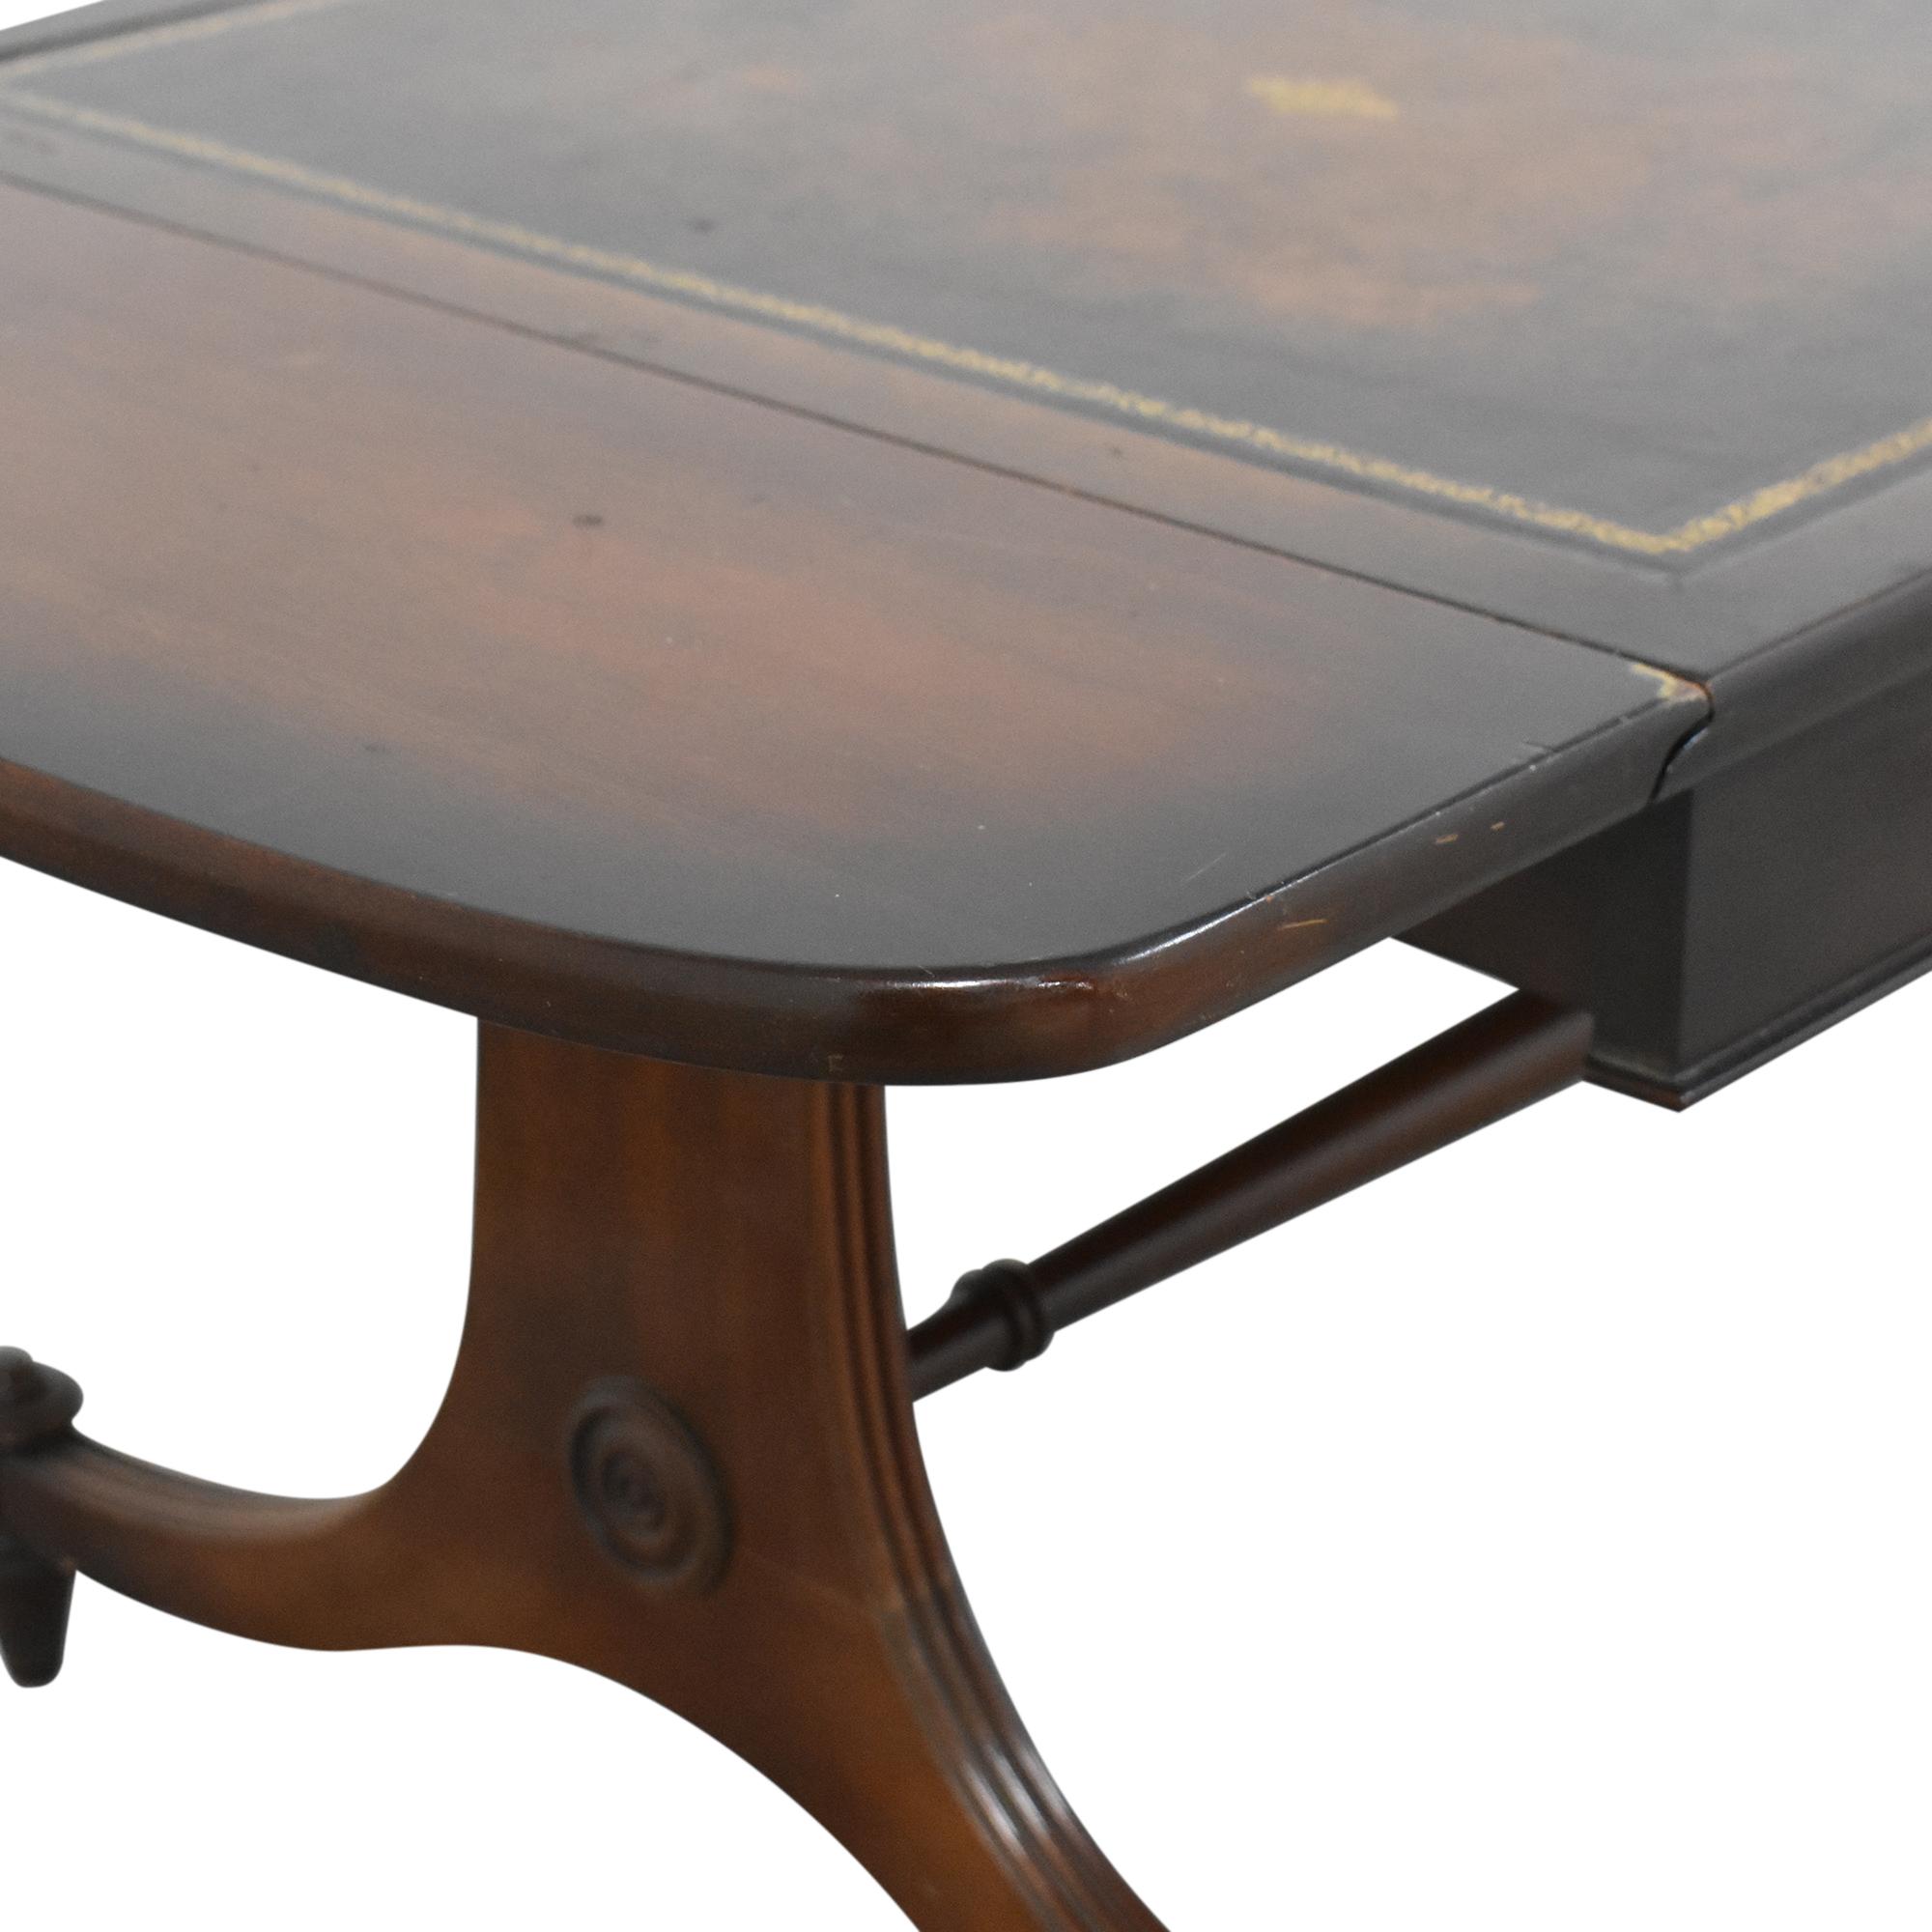 Gordon's Furniture Gordon's Furniture Drop Leaf Coffee Table nyc